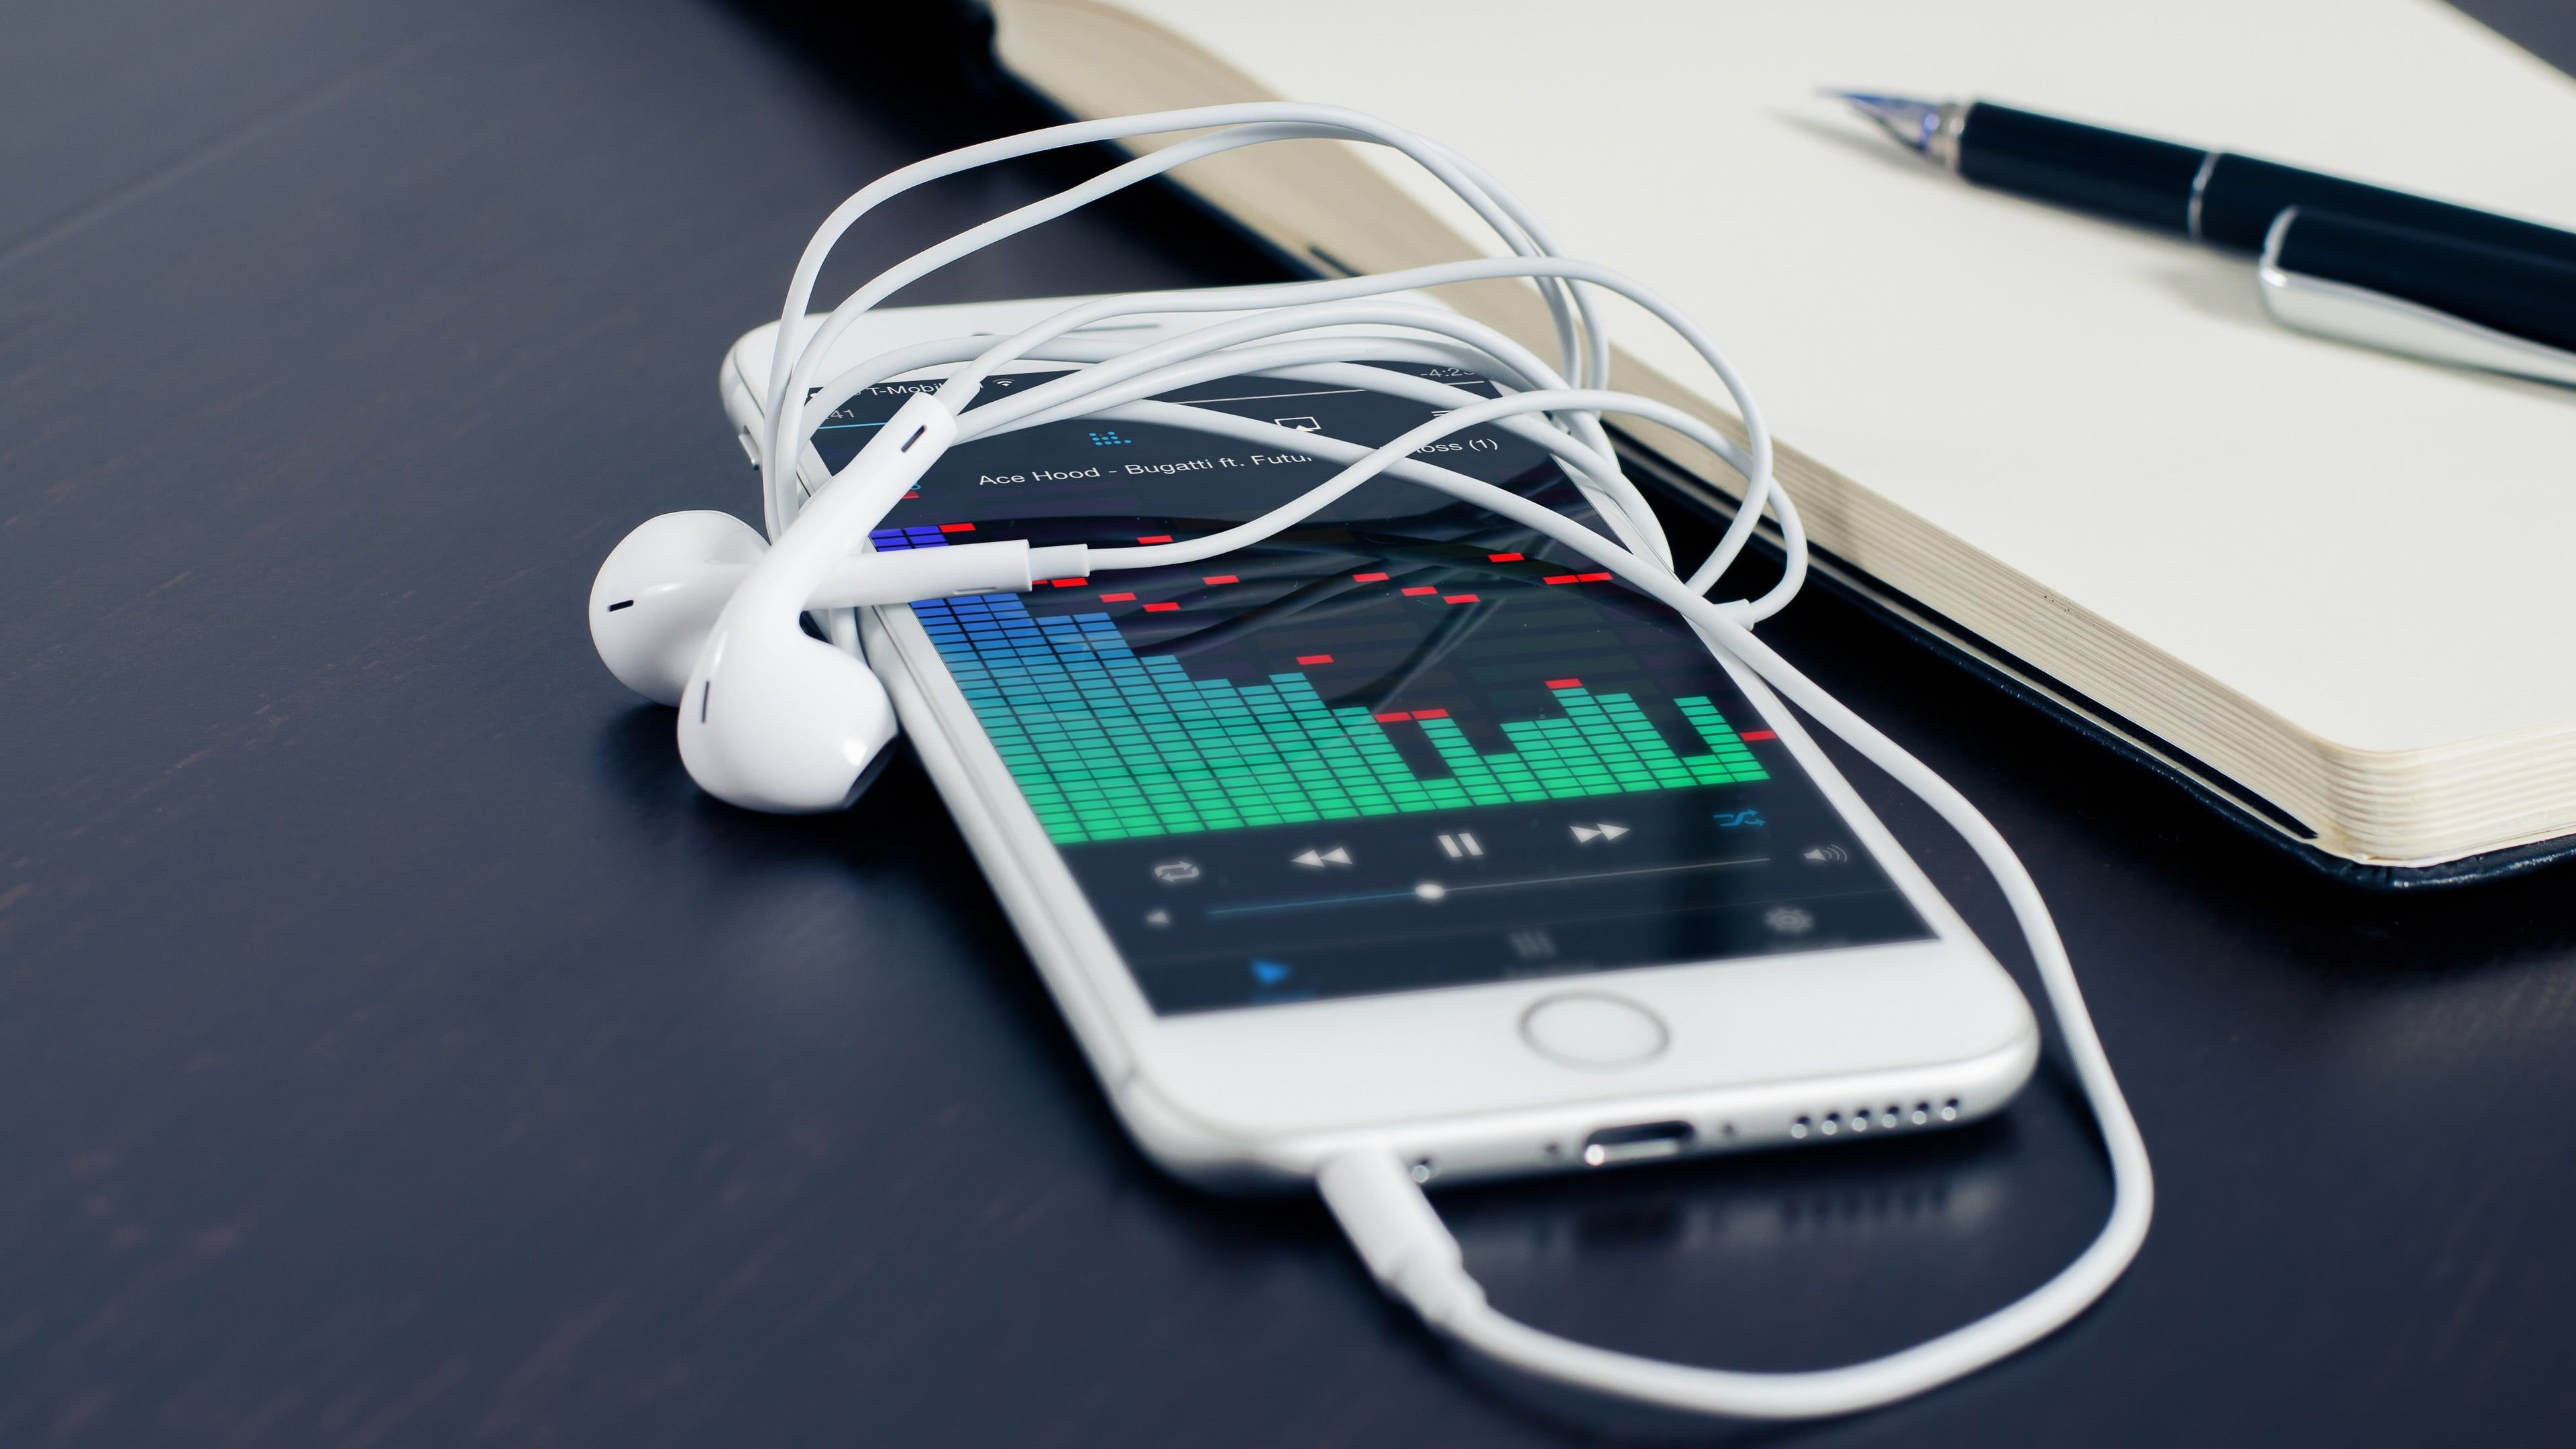 هندزفری iphone 6